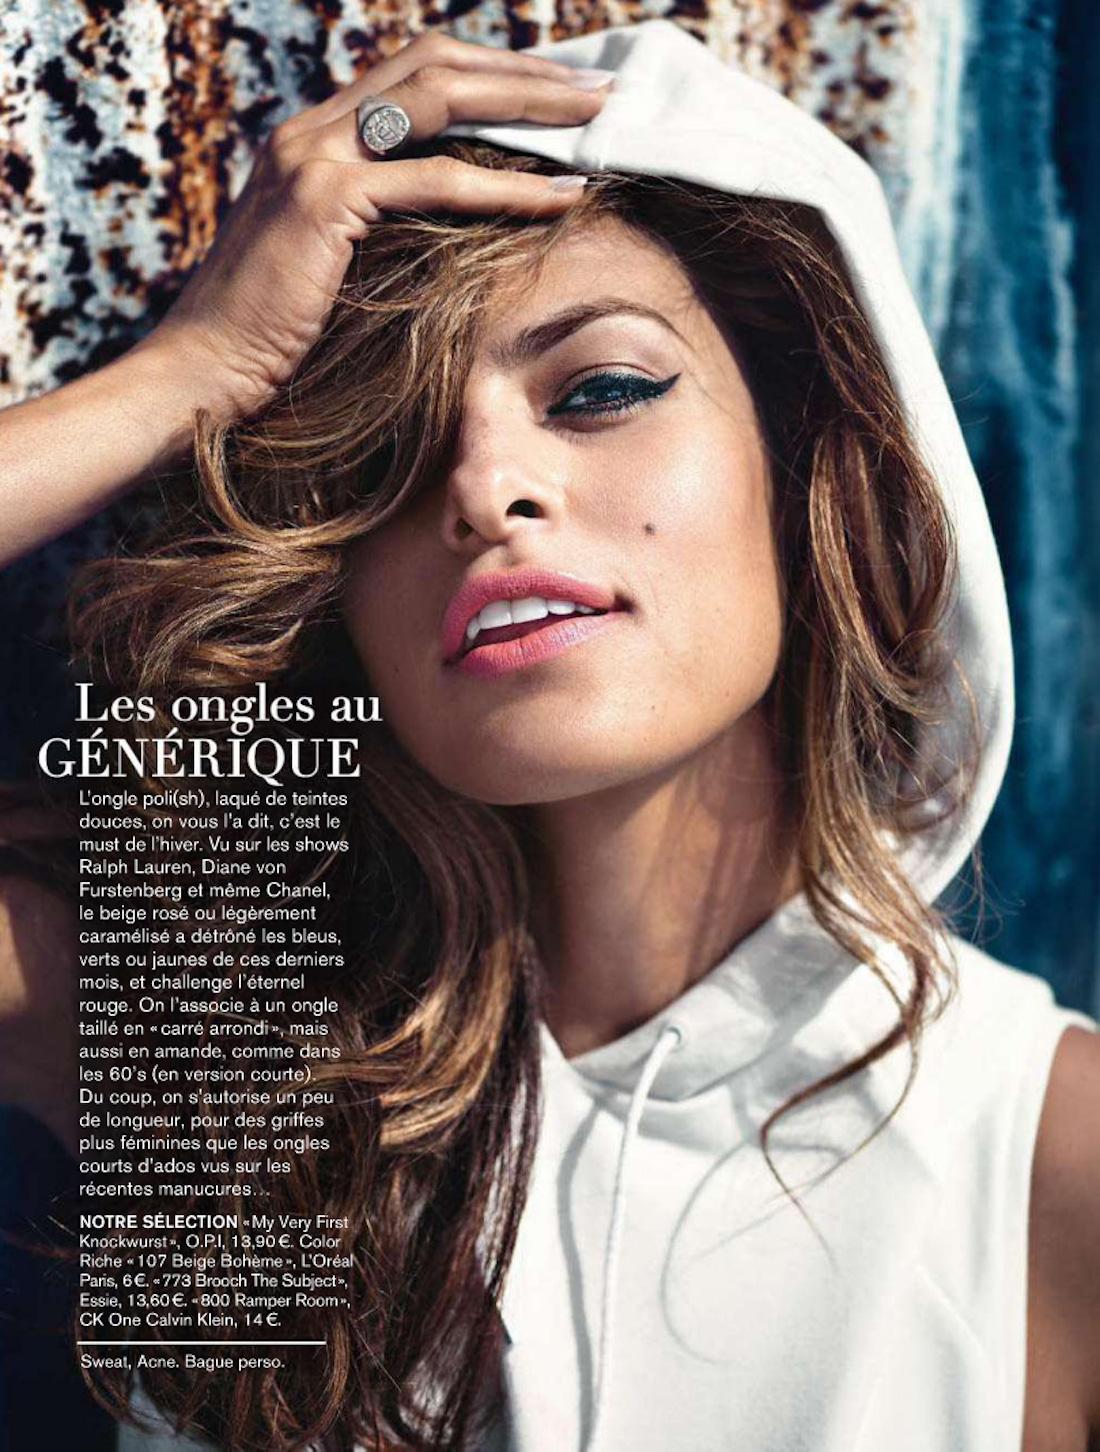 http://1.bp.blogspot.com/-Hf5x9tAQqPA/UHsf95QzCnI/AAAAAAAAVgg/fvKgCM2s9rU/s1600/eva-mendes-for-glamour-magazine-6.jpg